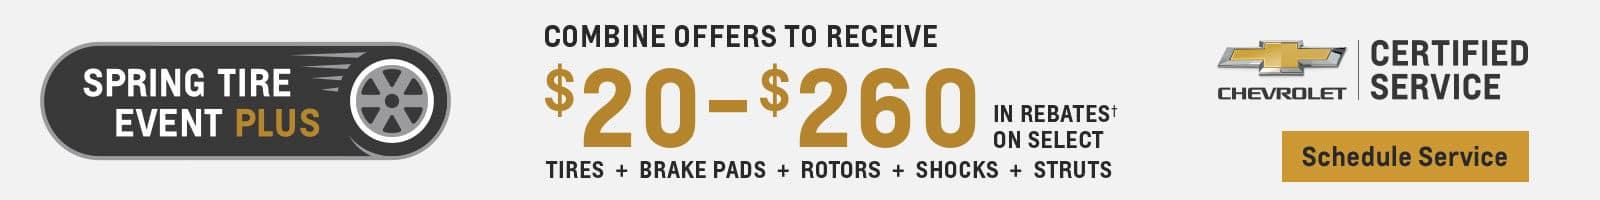 Spring Tire Event Plus $20-$260 in rebates on select tires brake pads rotors shocks struts